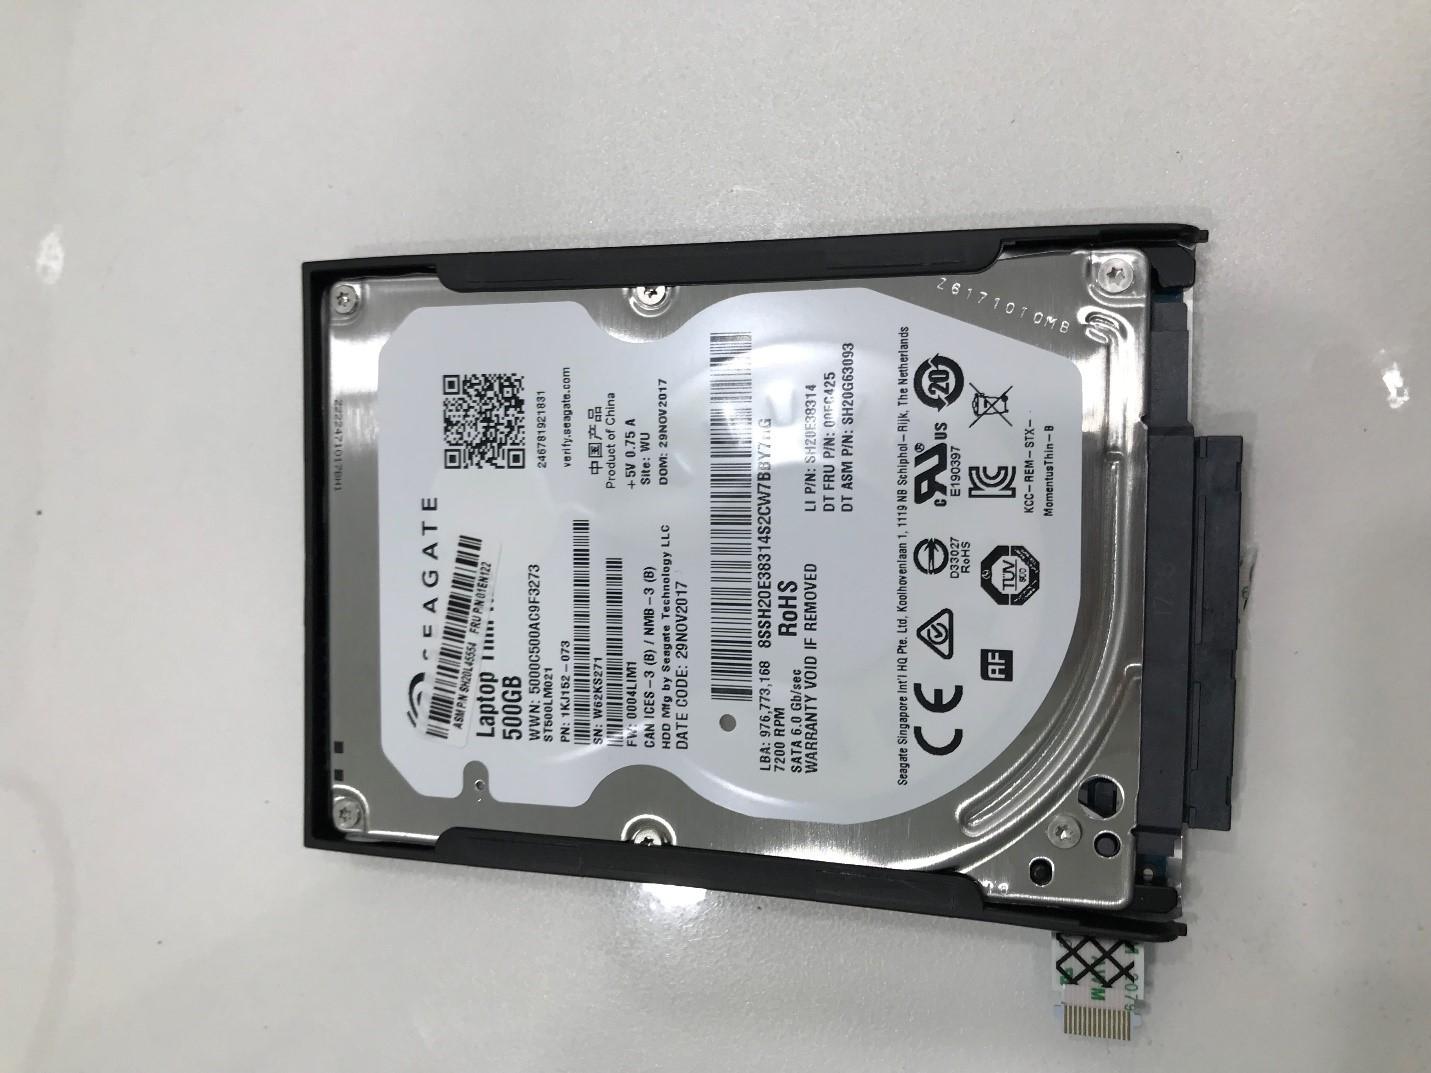 Seagate 500G 7200rpm HDD